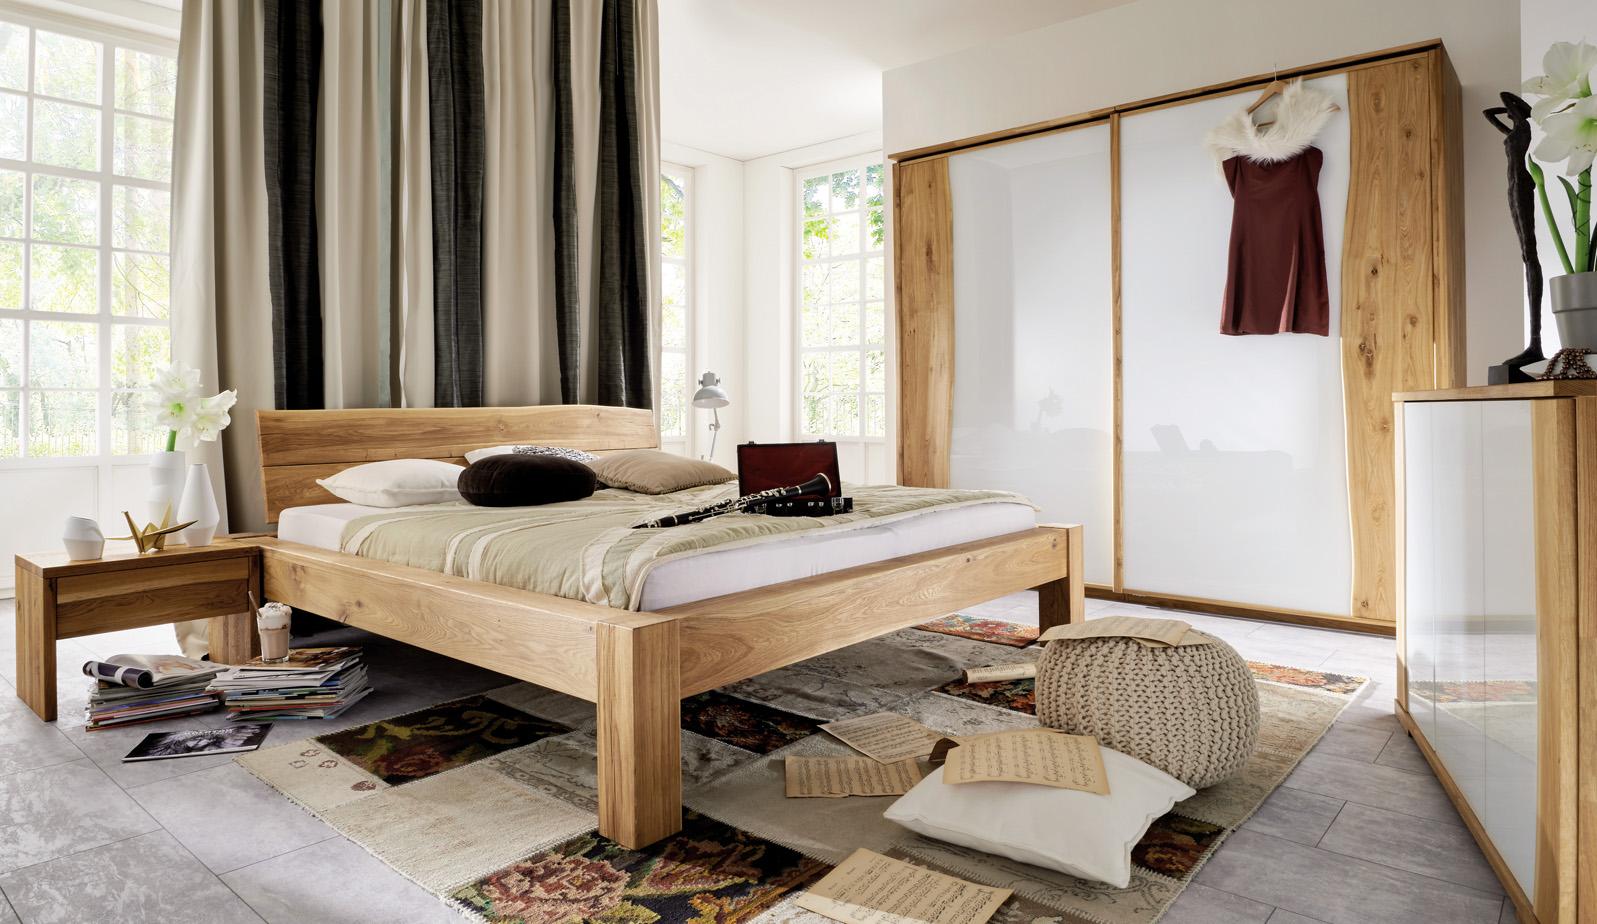 Full Size of Schlafzimmer Massivholz Dansk Design Massivholzmbel Komplettes Stehlampe Teppich Luxus Romantische Betten Komplett Guenstig Komplette Led Deckenleuchte Schlafzimmer Massivholz Schlafzimmer